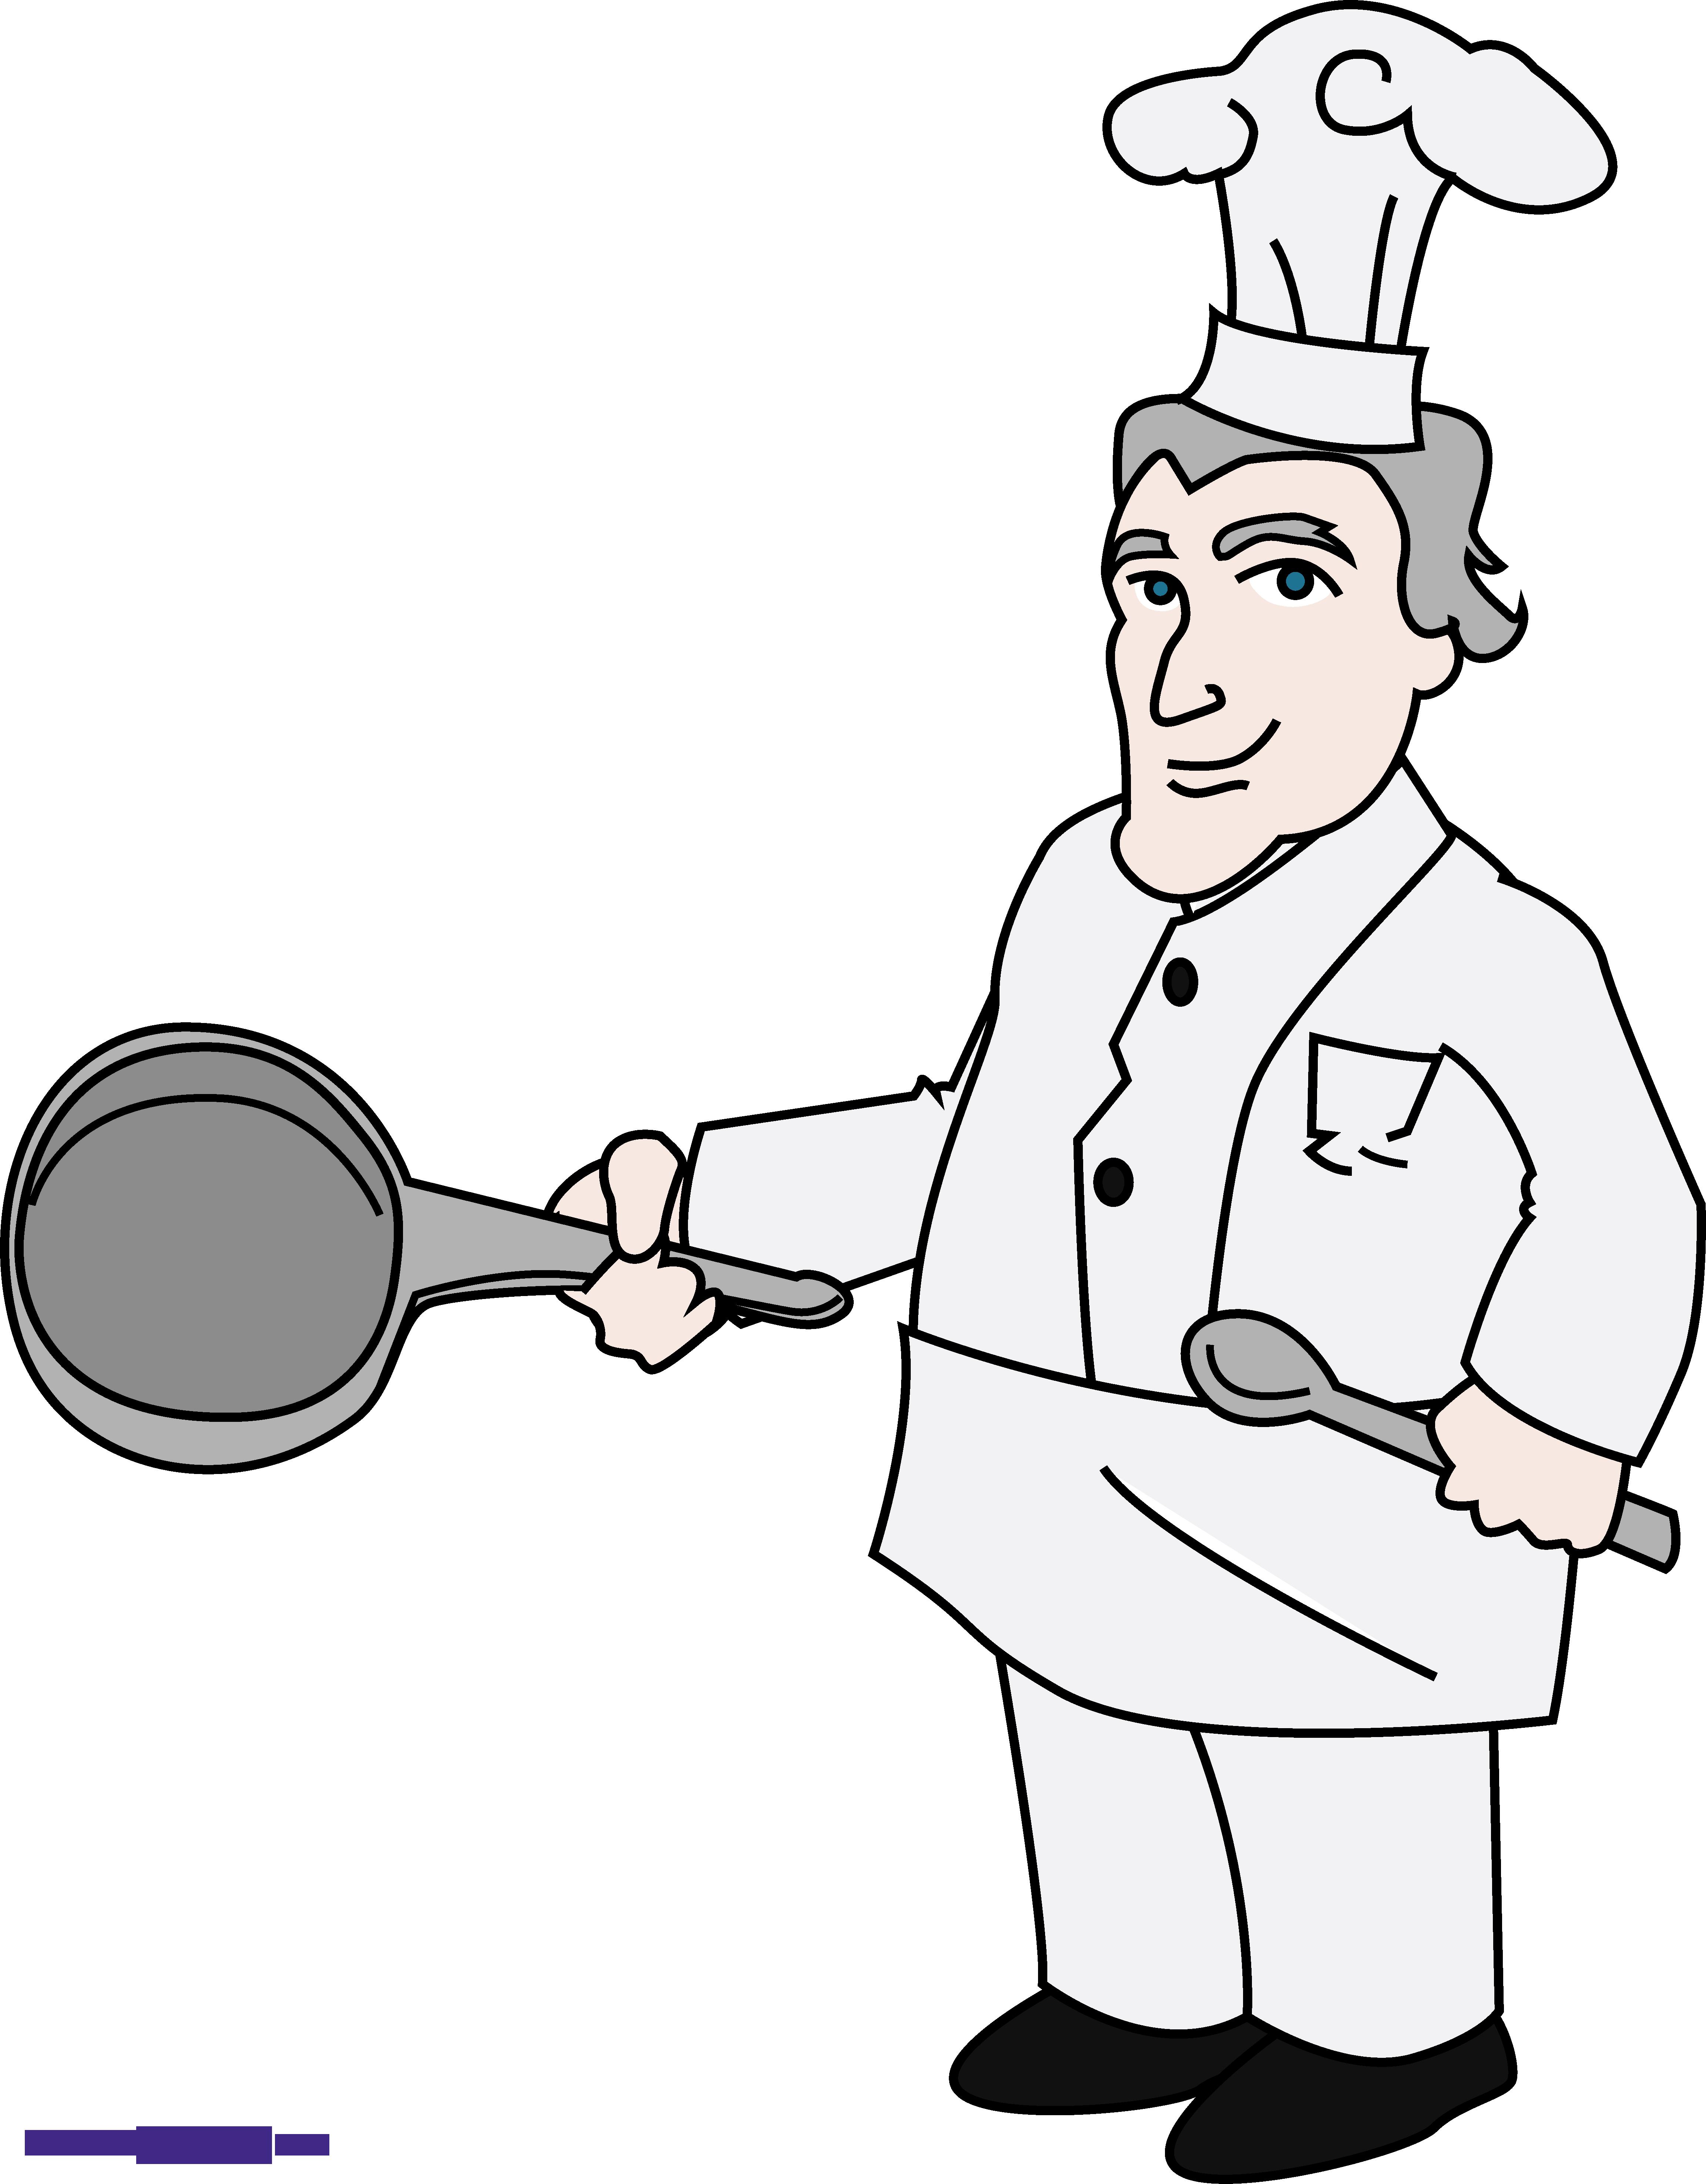 Clipart chef banner Chef Clip Art Clipart - Sweet Clip Art banner